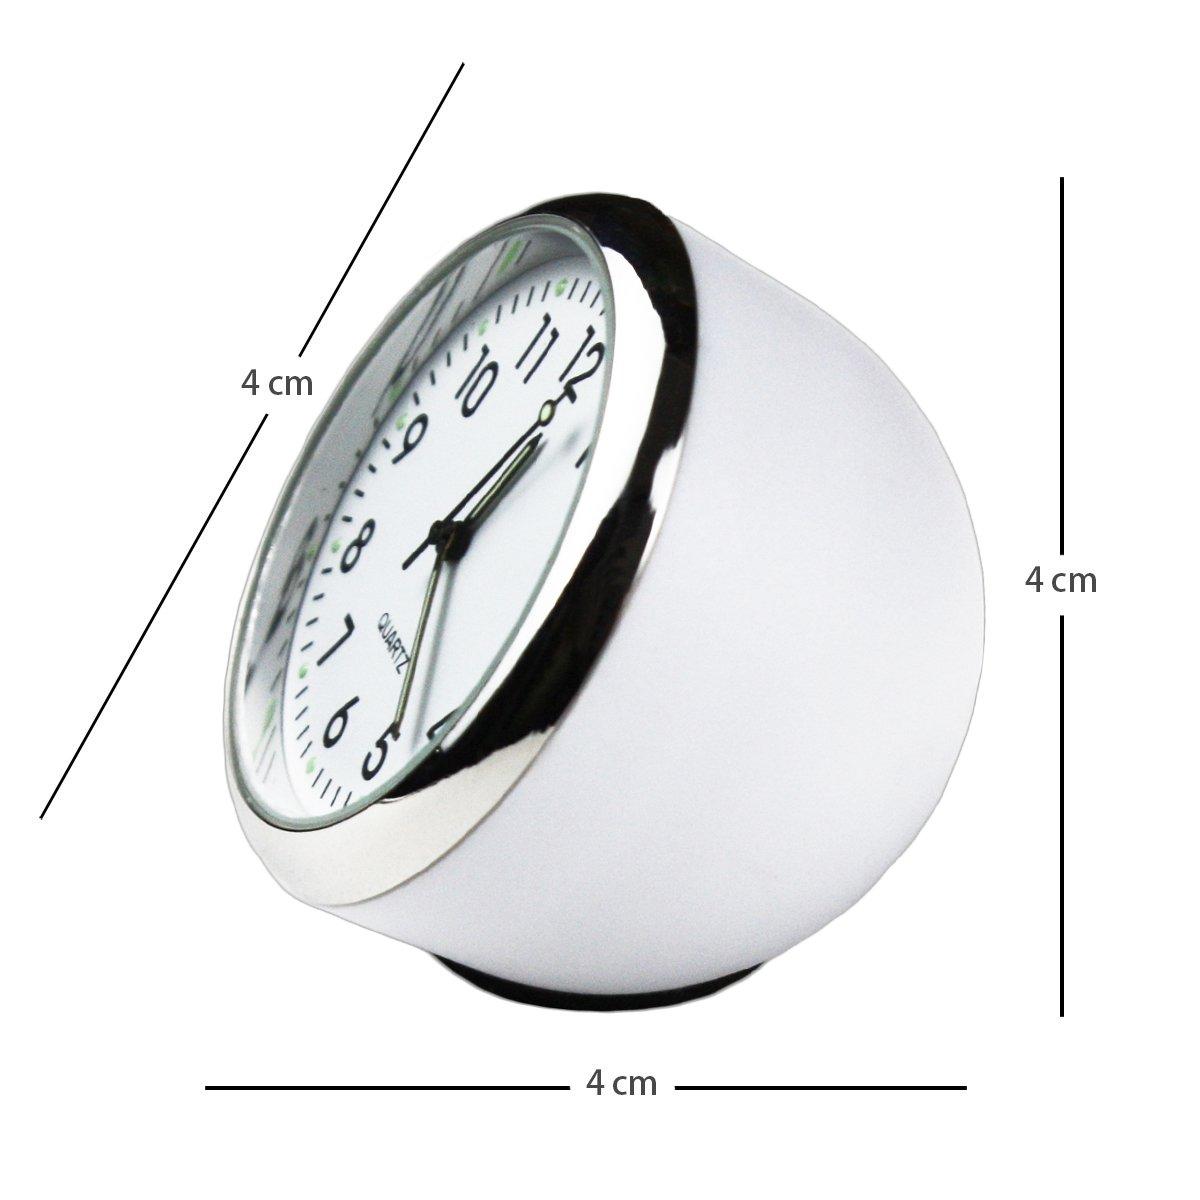 Txian Custom High Accuracy Car Clock Small Round Onboard Quartz Clock Perfect Car Decoration